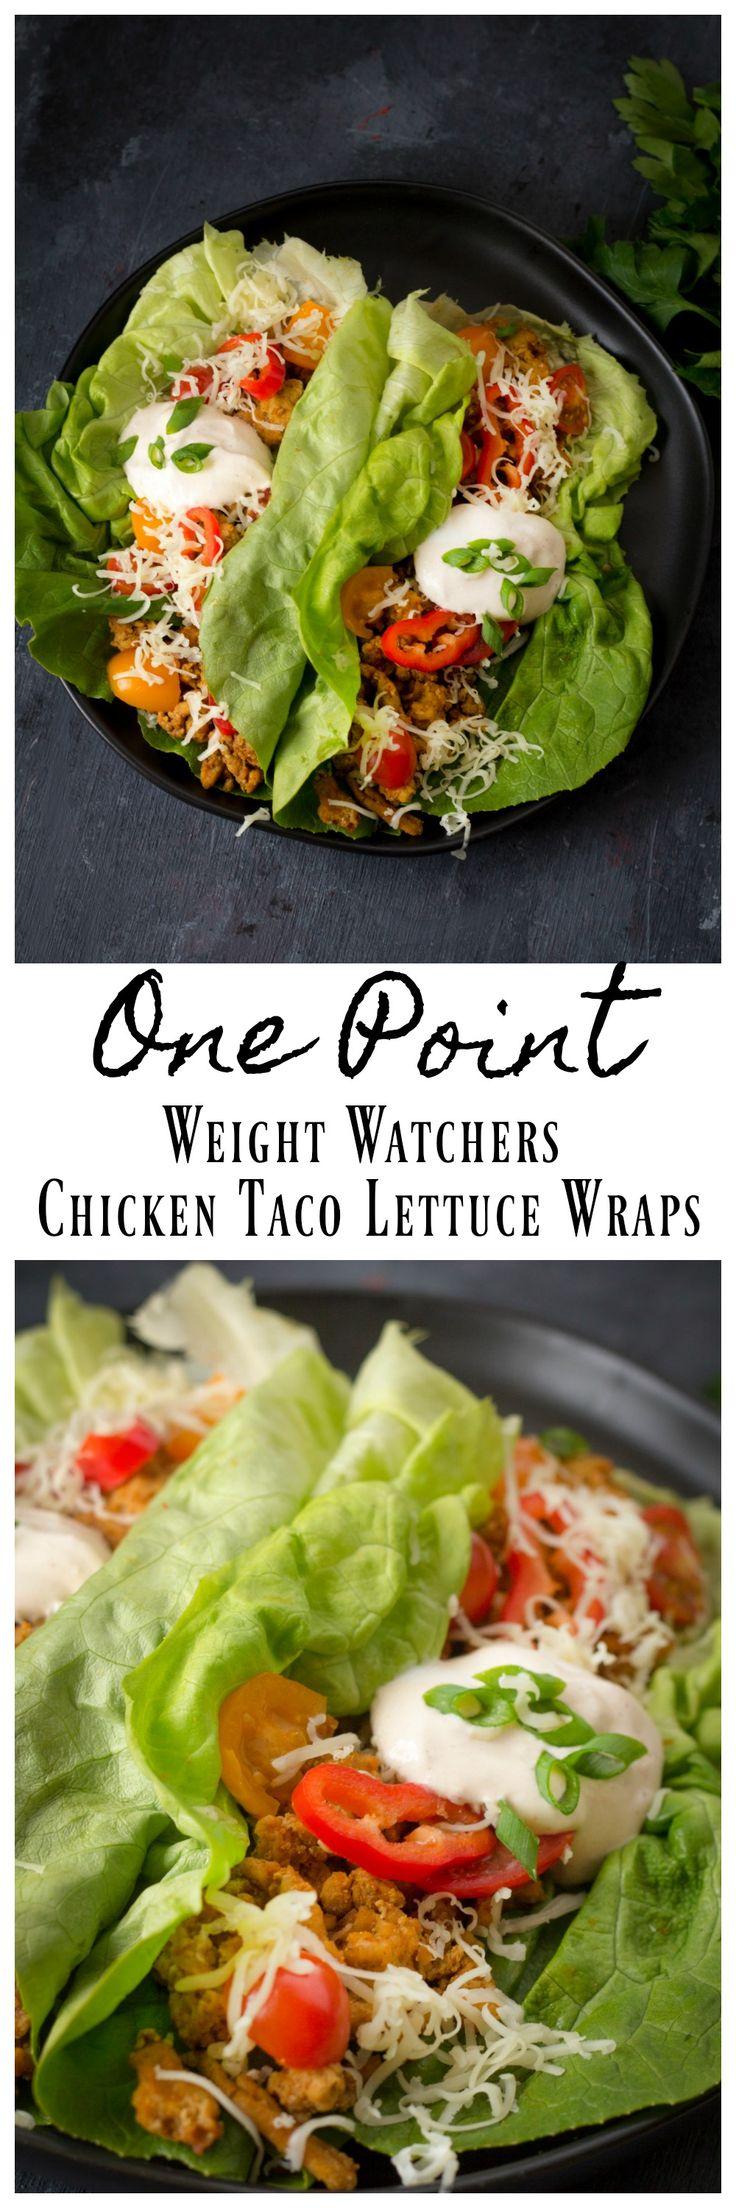 Chicken taco lettuce wrap